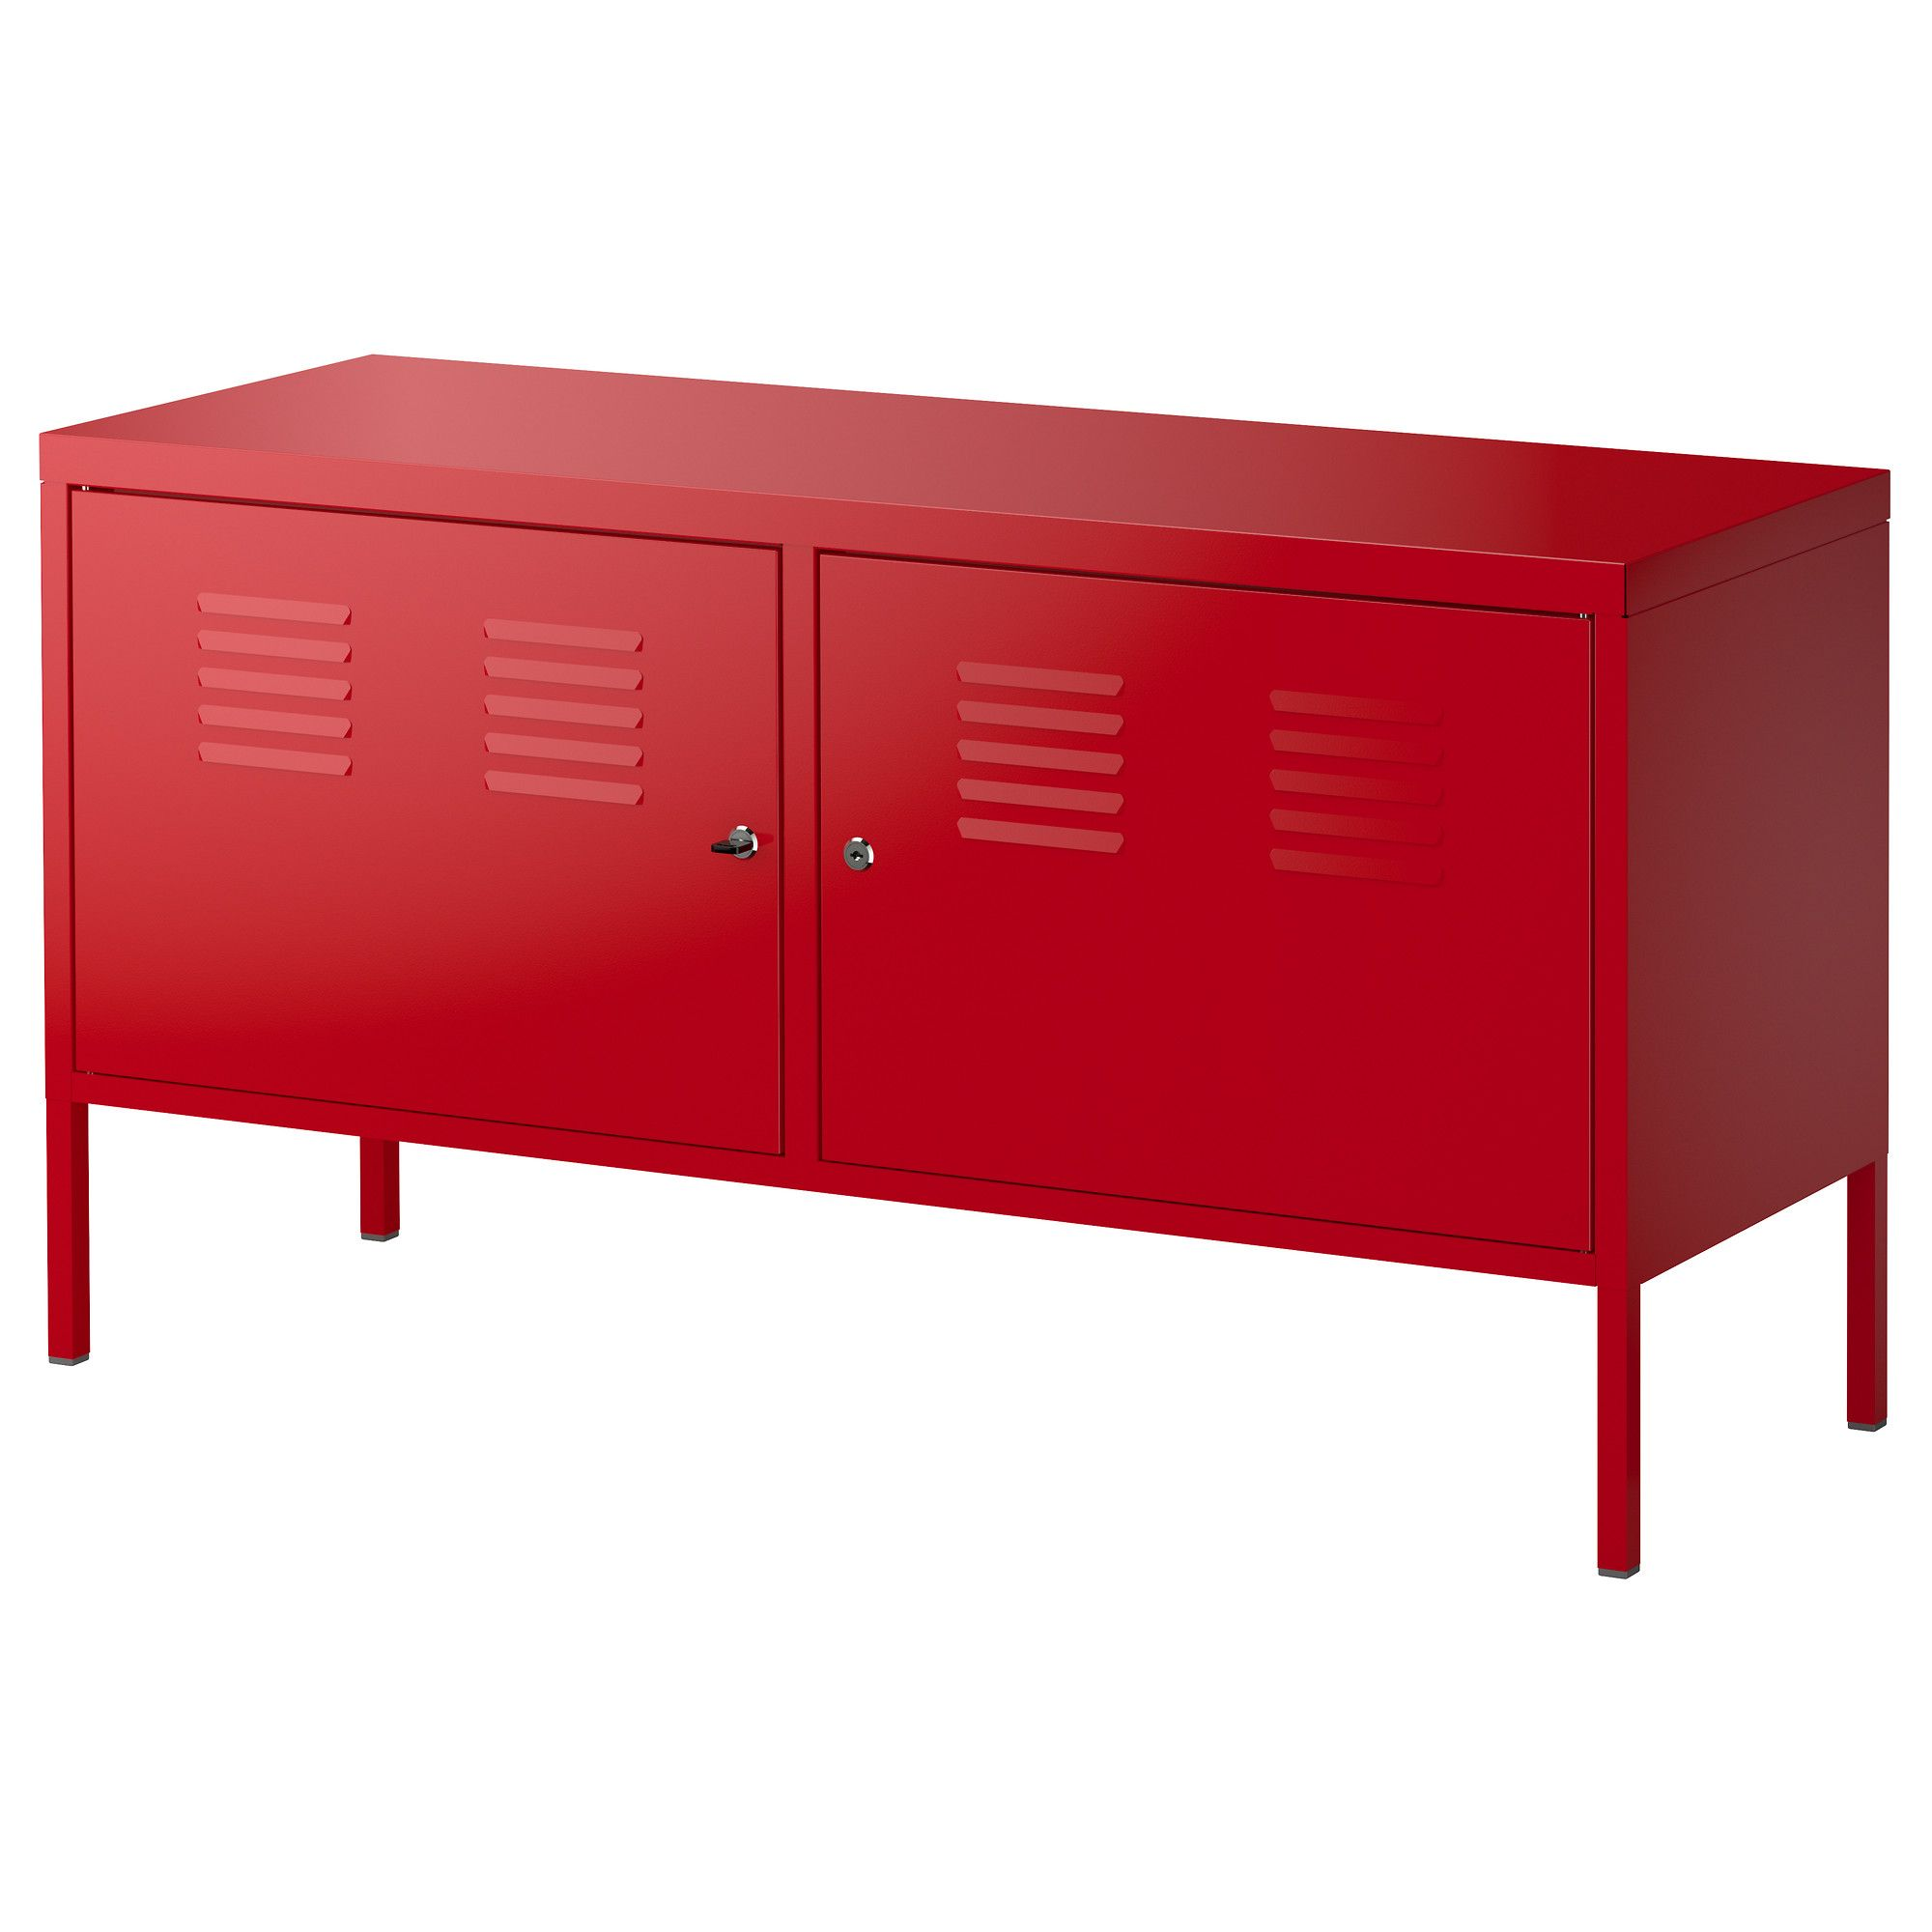 Ps Schrank Rot Ikea Deutschland Ikea Ps Schrank